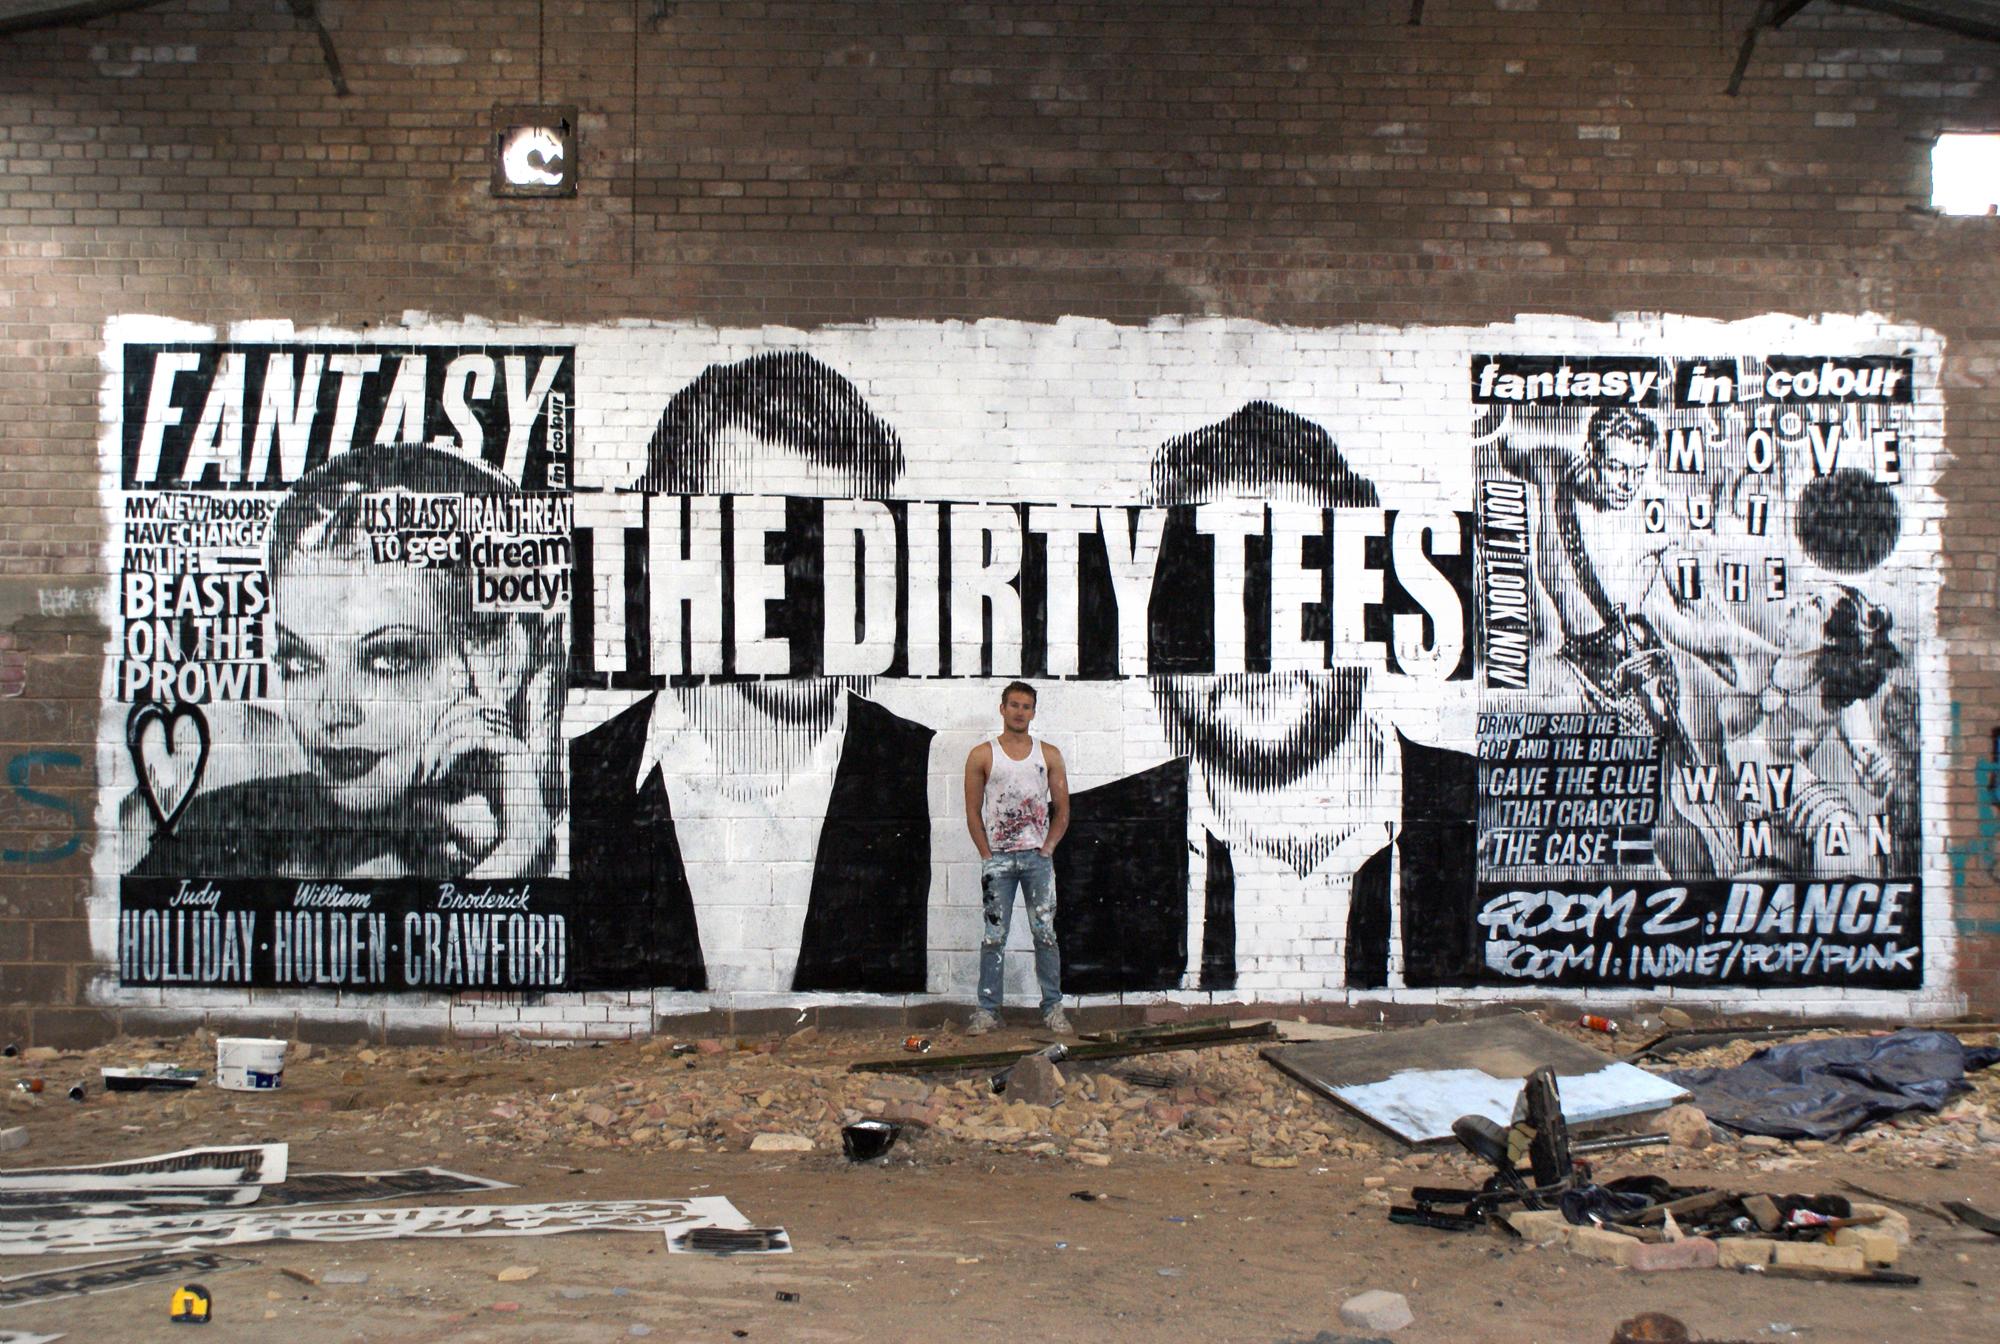 Mural for the Dirty Tees Edinburgh 2012